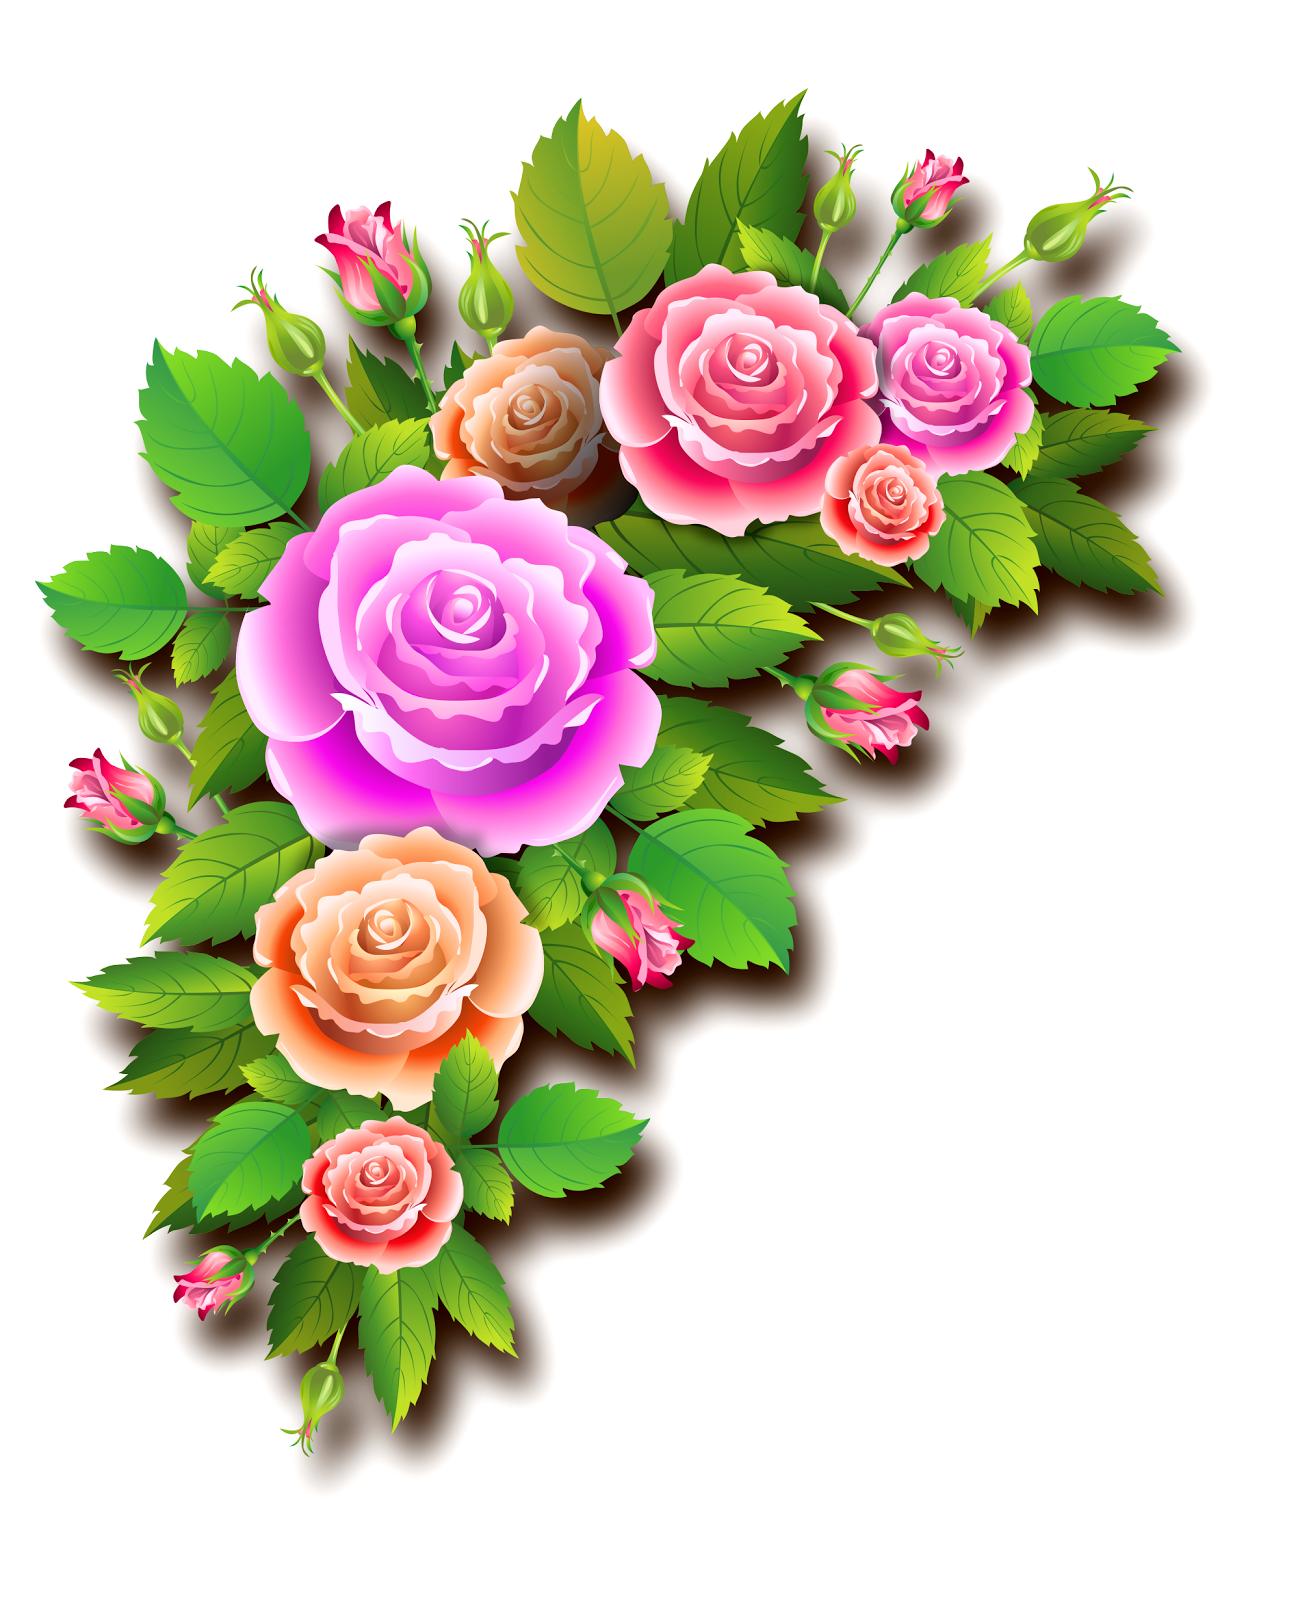 [roses_13072017_a1_aalmeidah%5B4%5D]